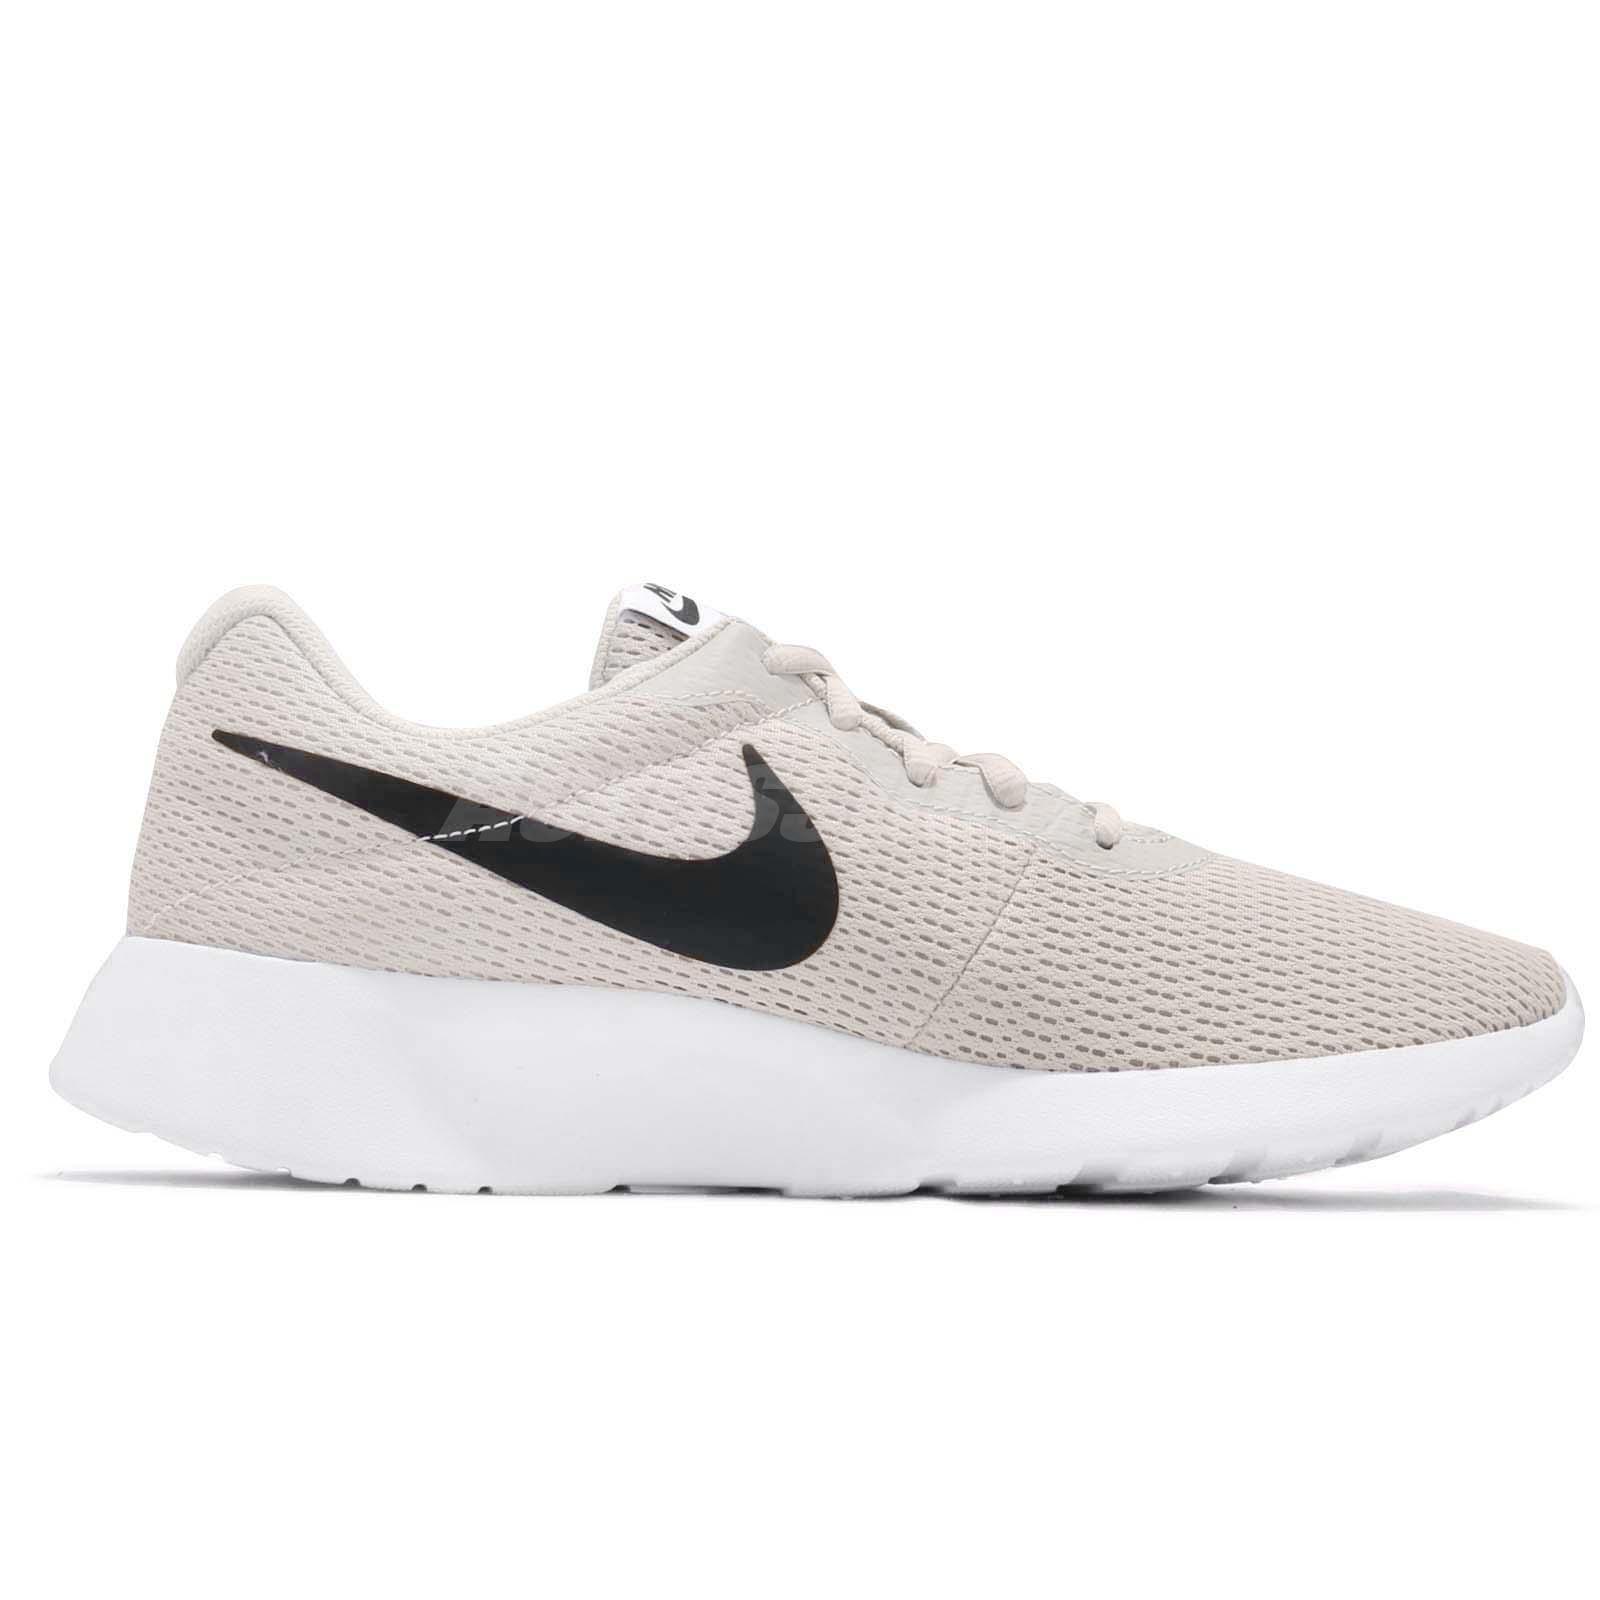 ccd9a0833ba90 Nike Tanjun Light Bone Black White Men Running Shoes Sneakers ...